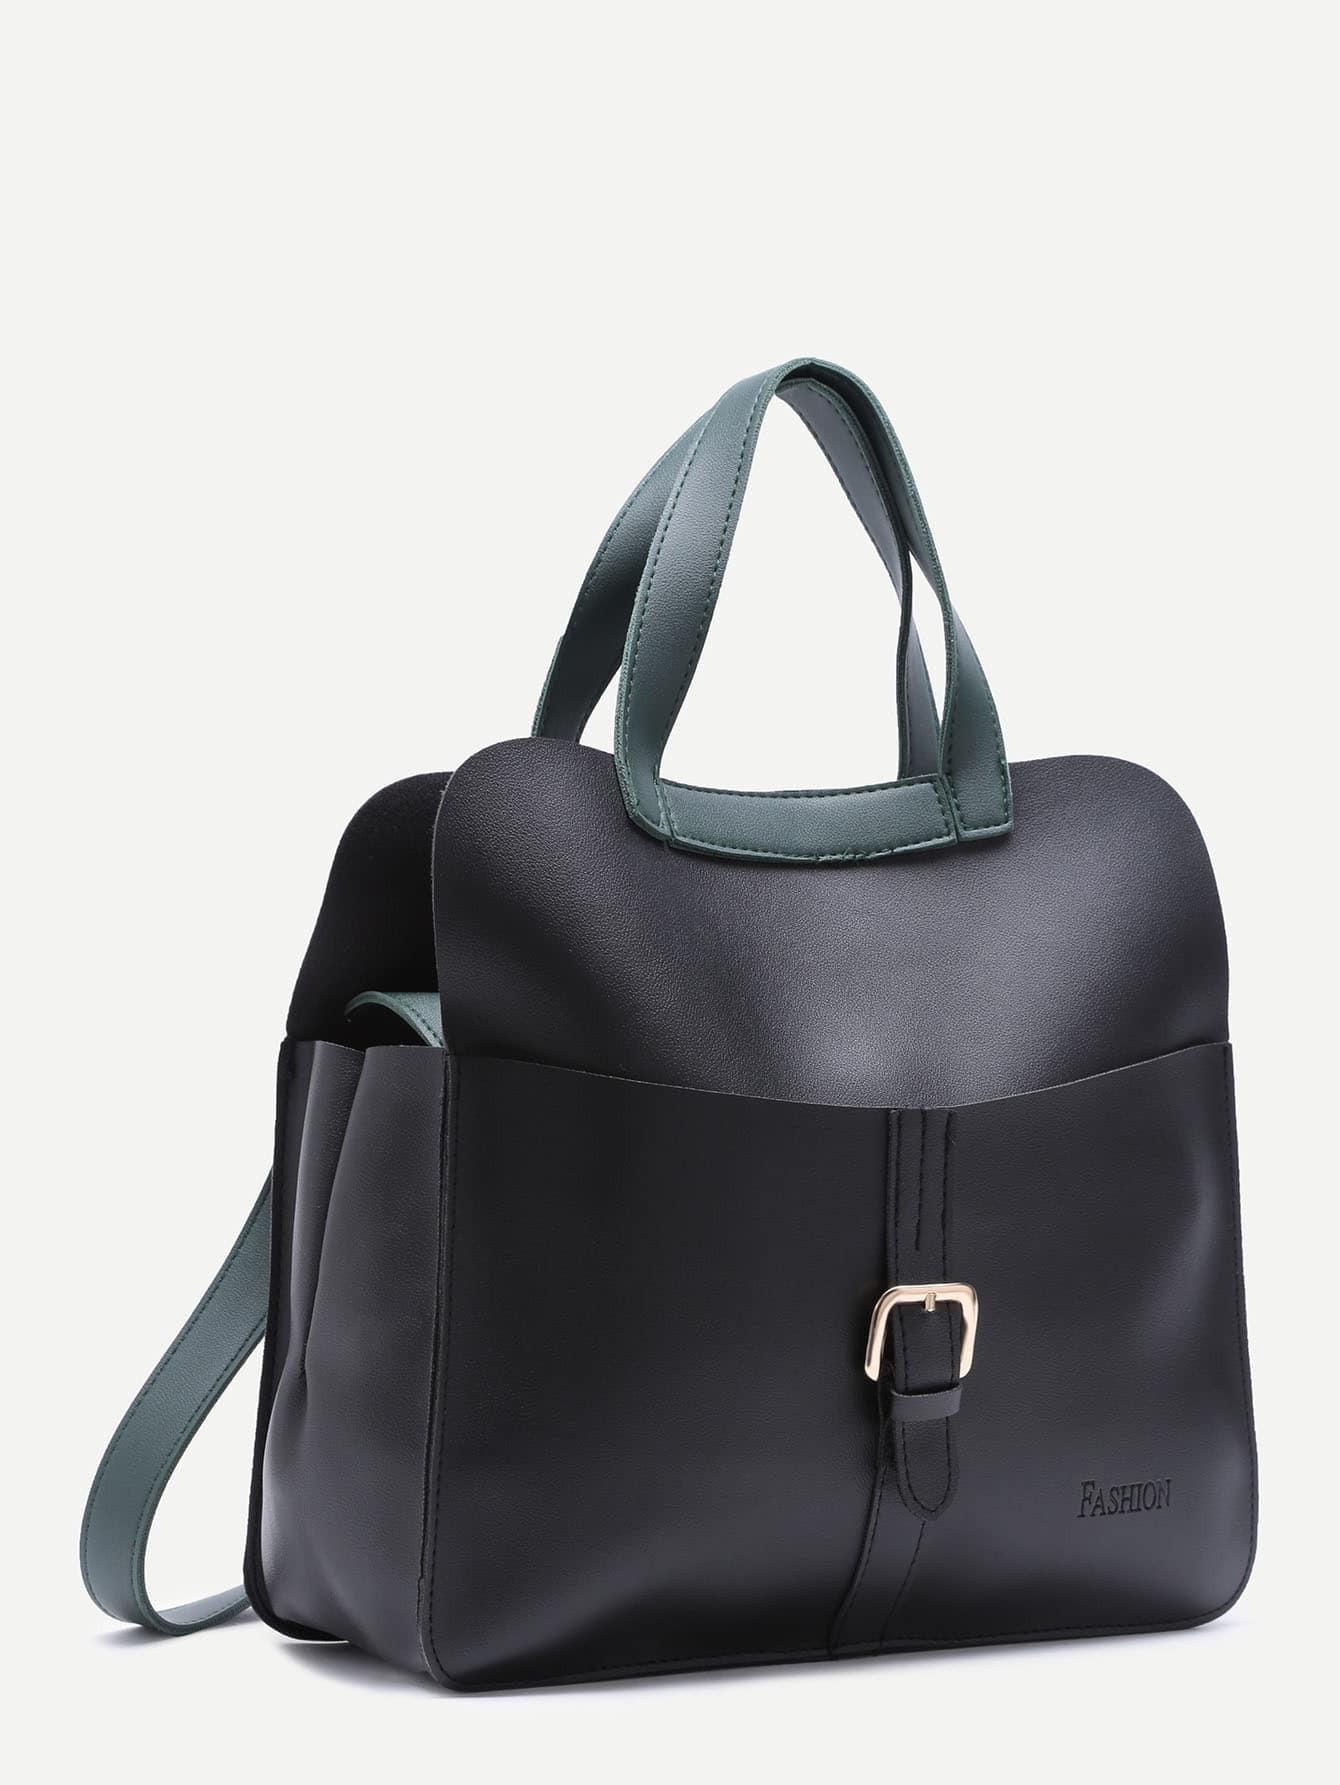 bag161026312_2